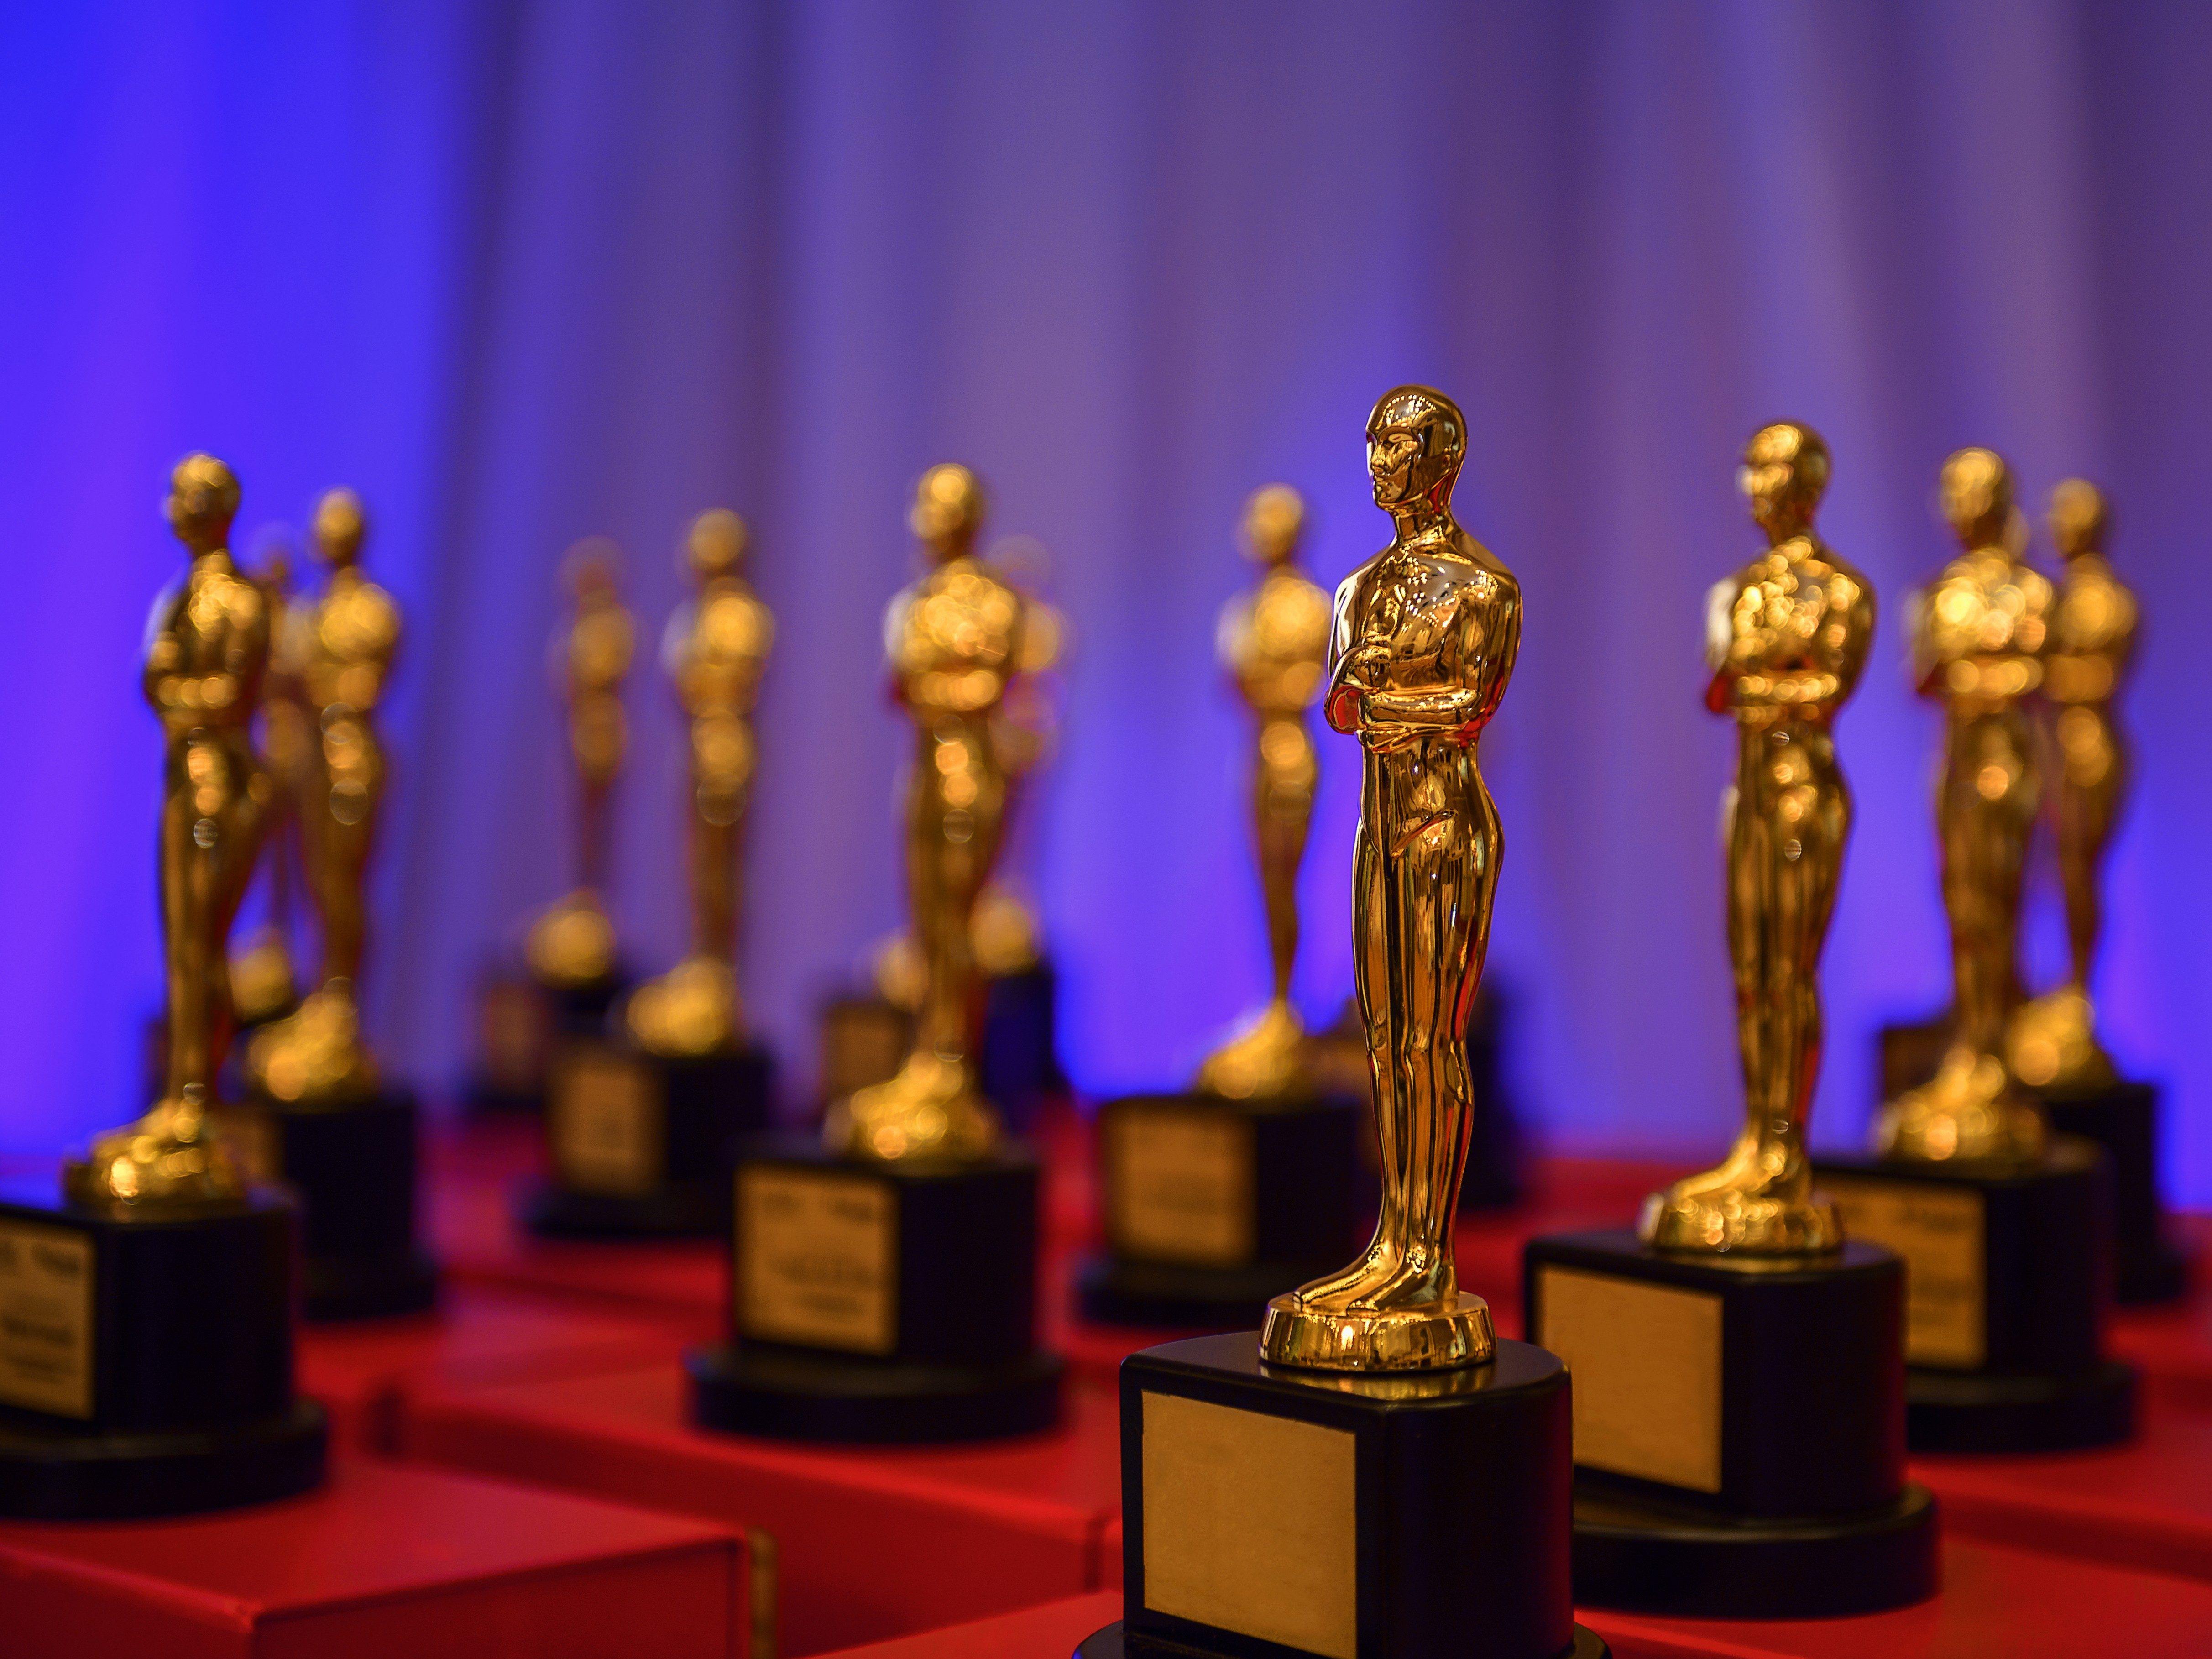 10 OSCAR-NOMINATED FILMS BASED ON BOOKS